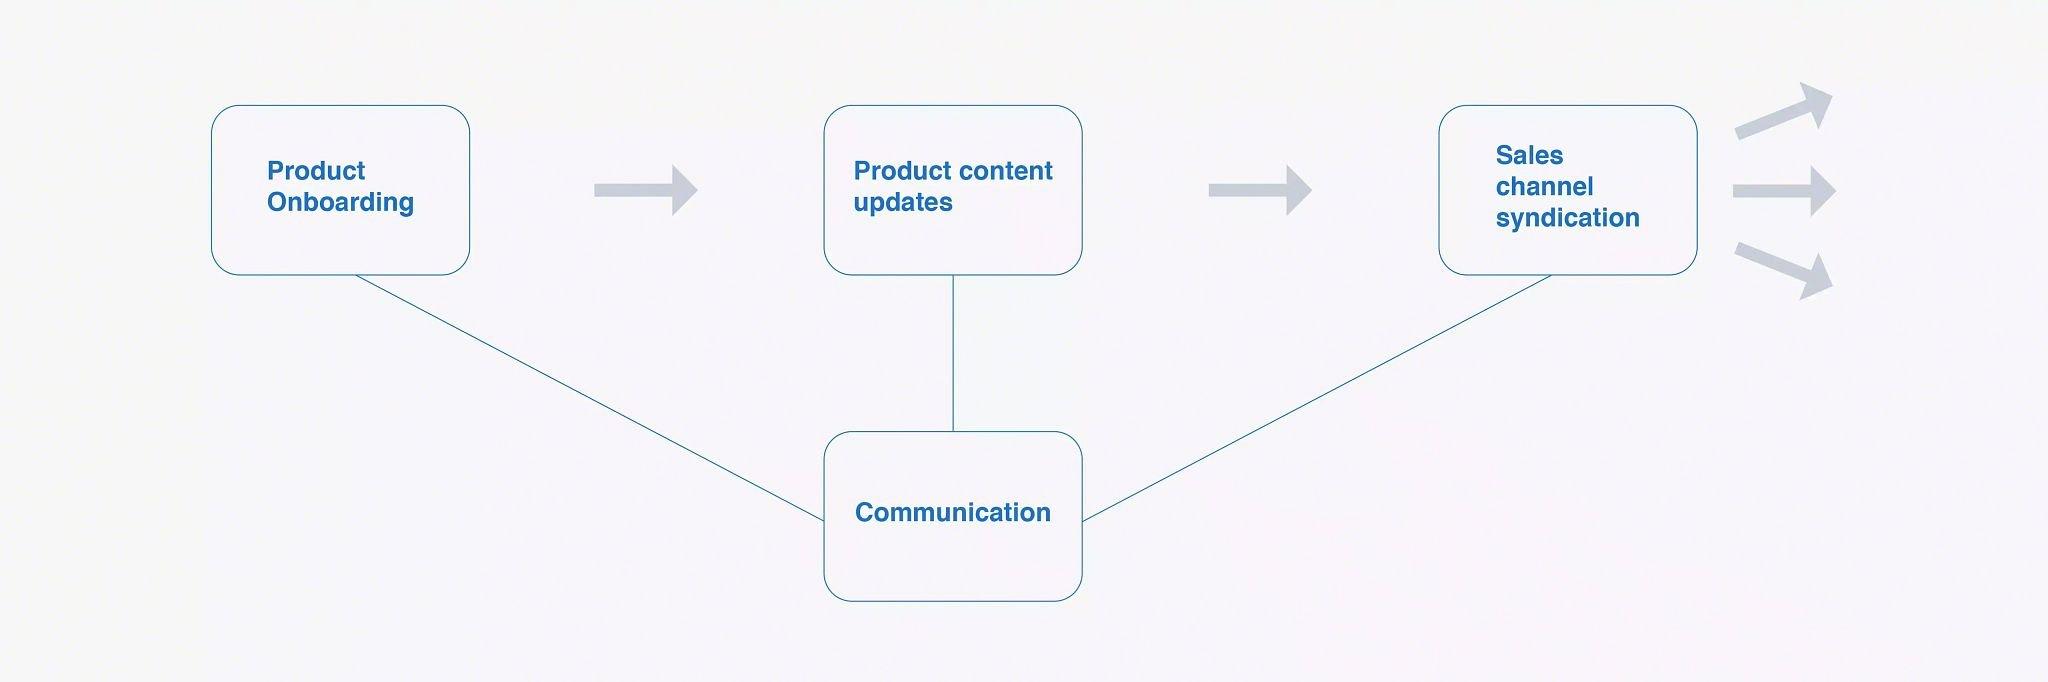 Illustration of a PIM workflow